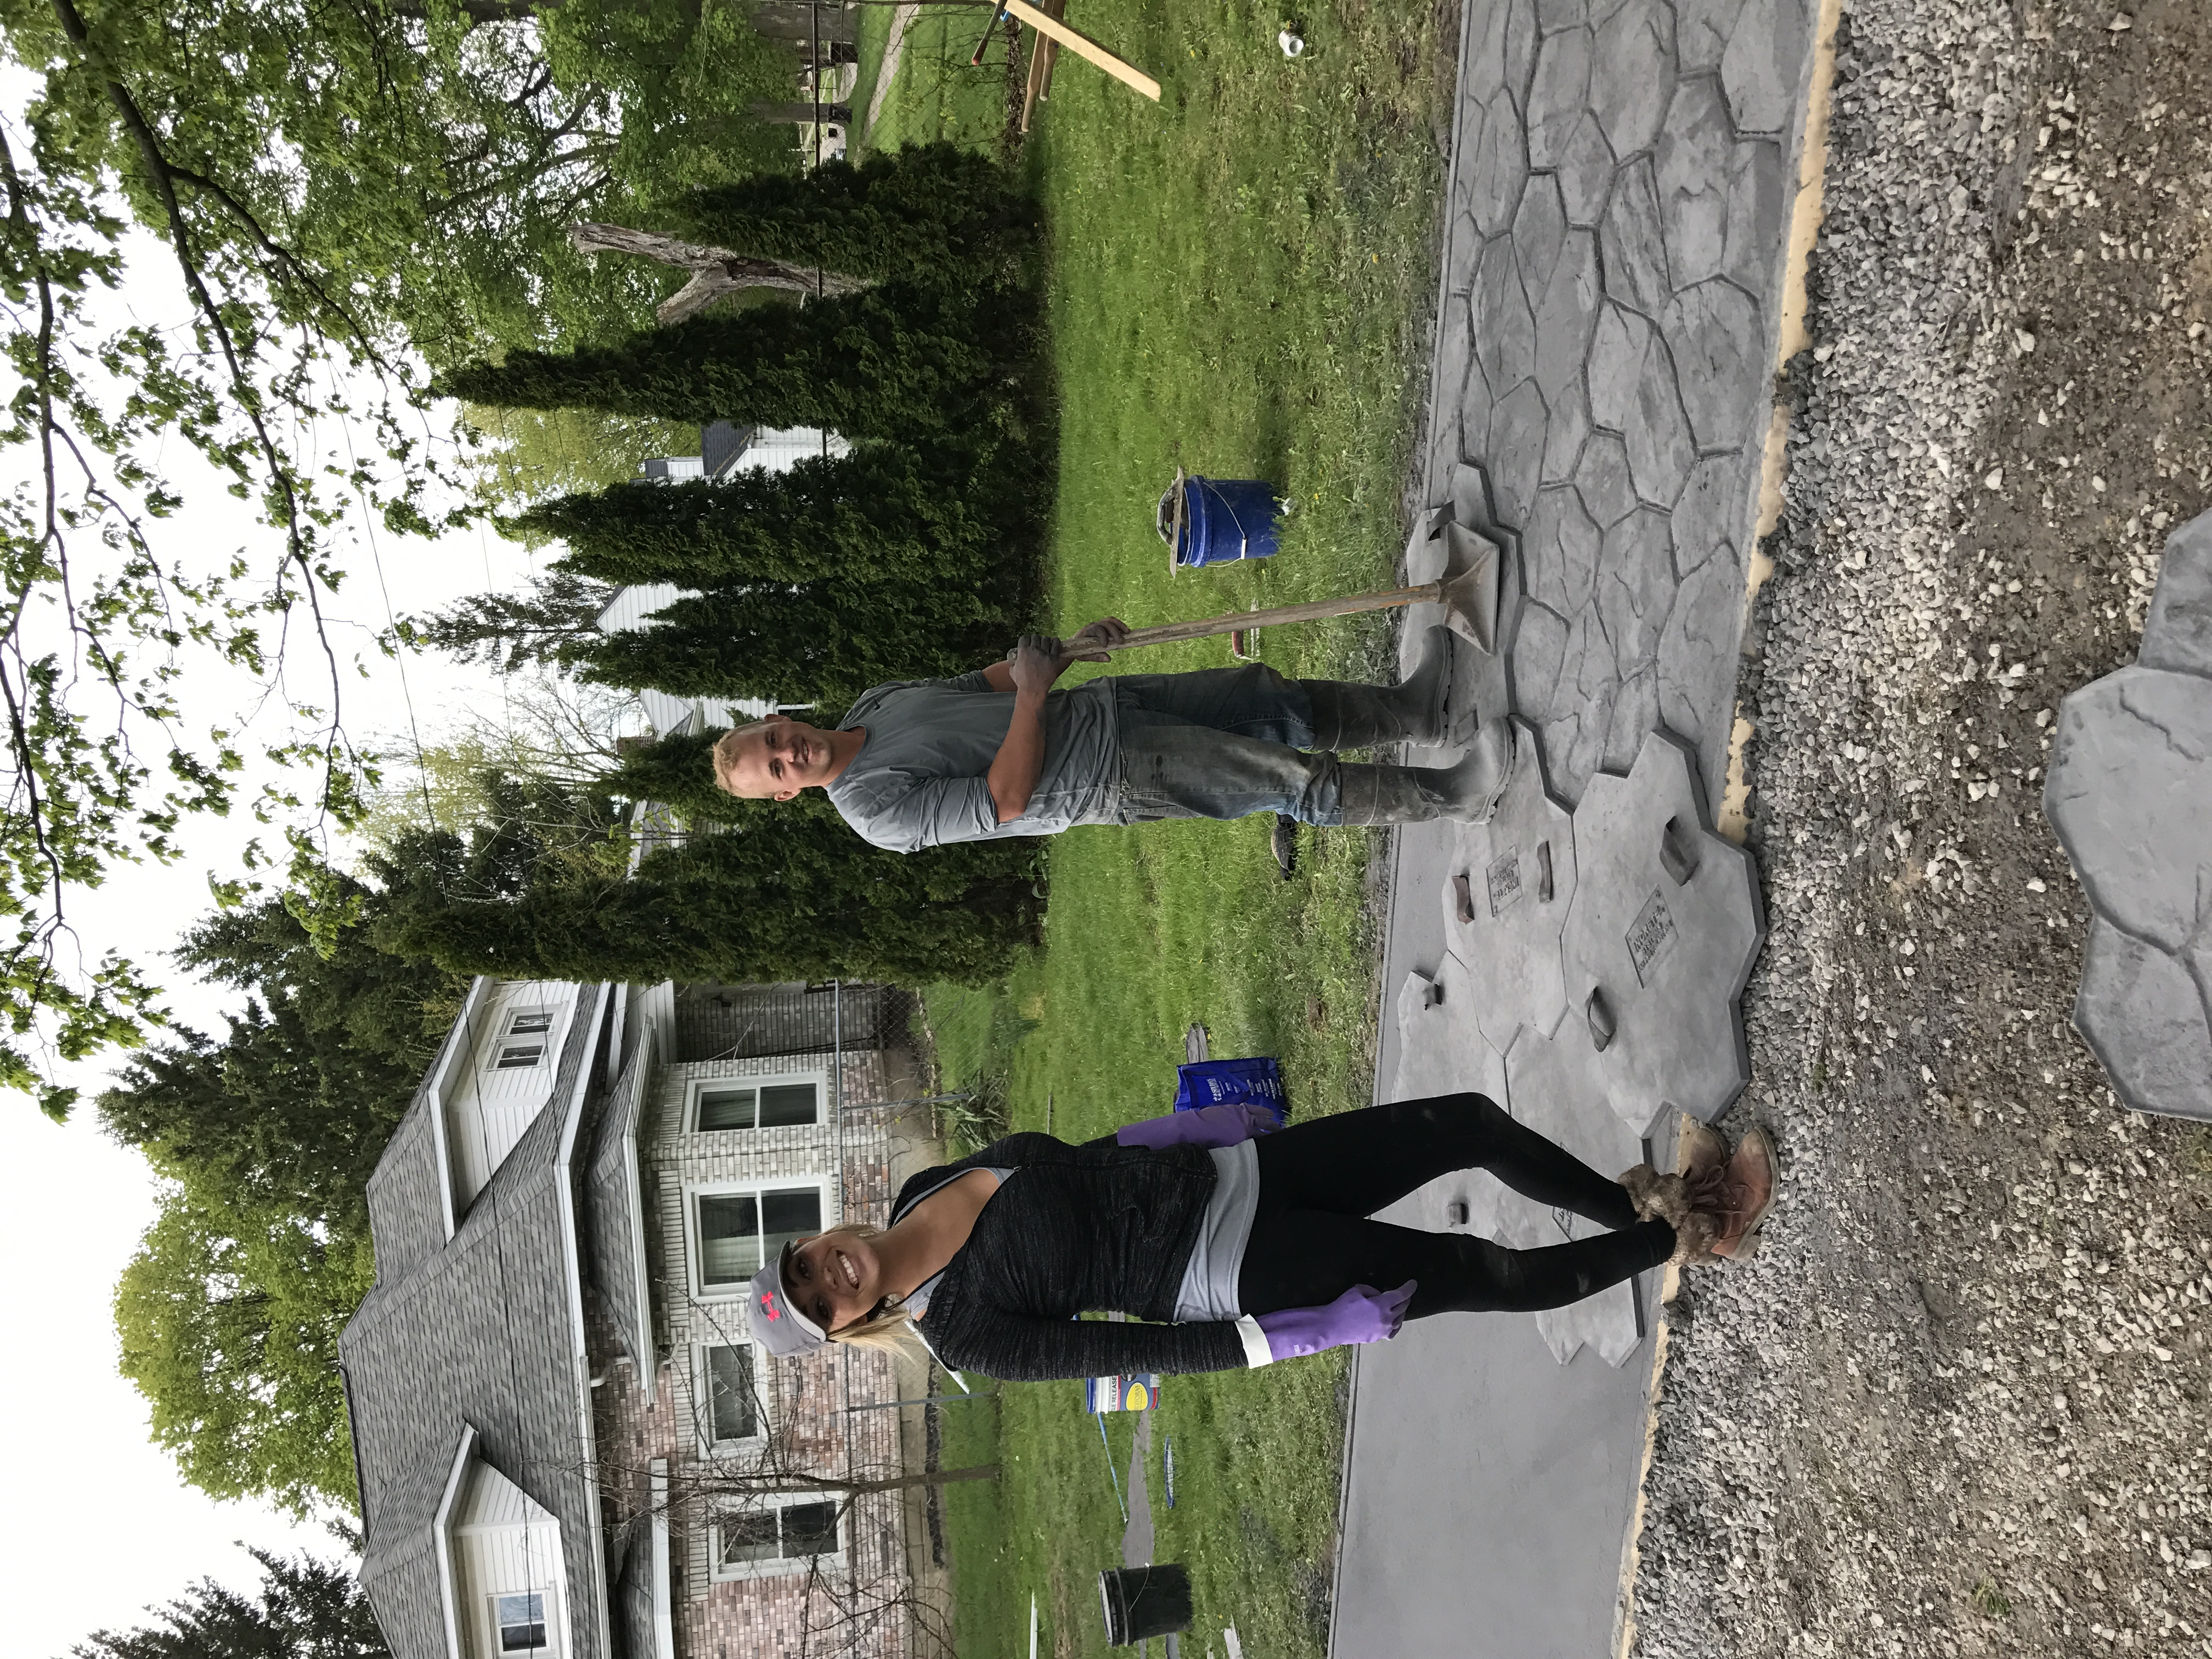 Monica & Jesse Stamping Concrete